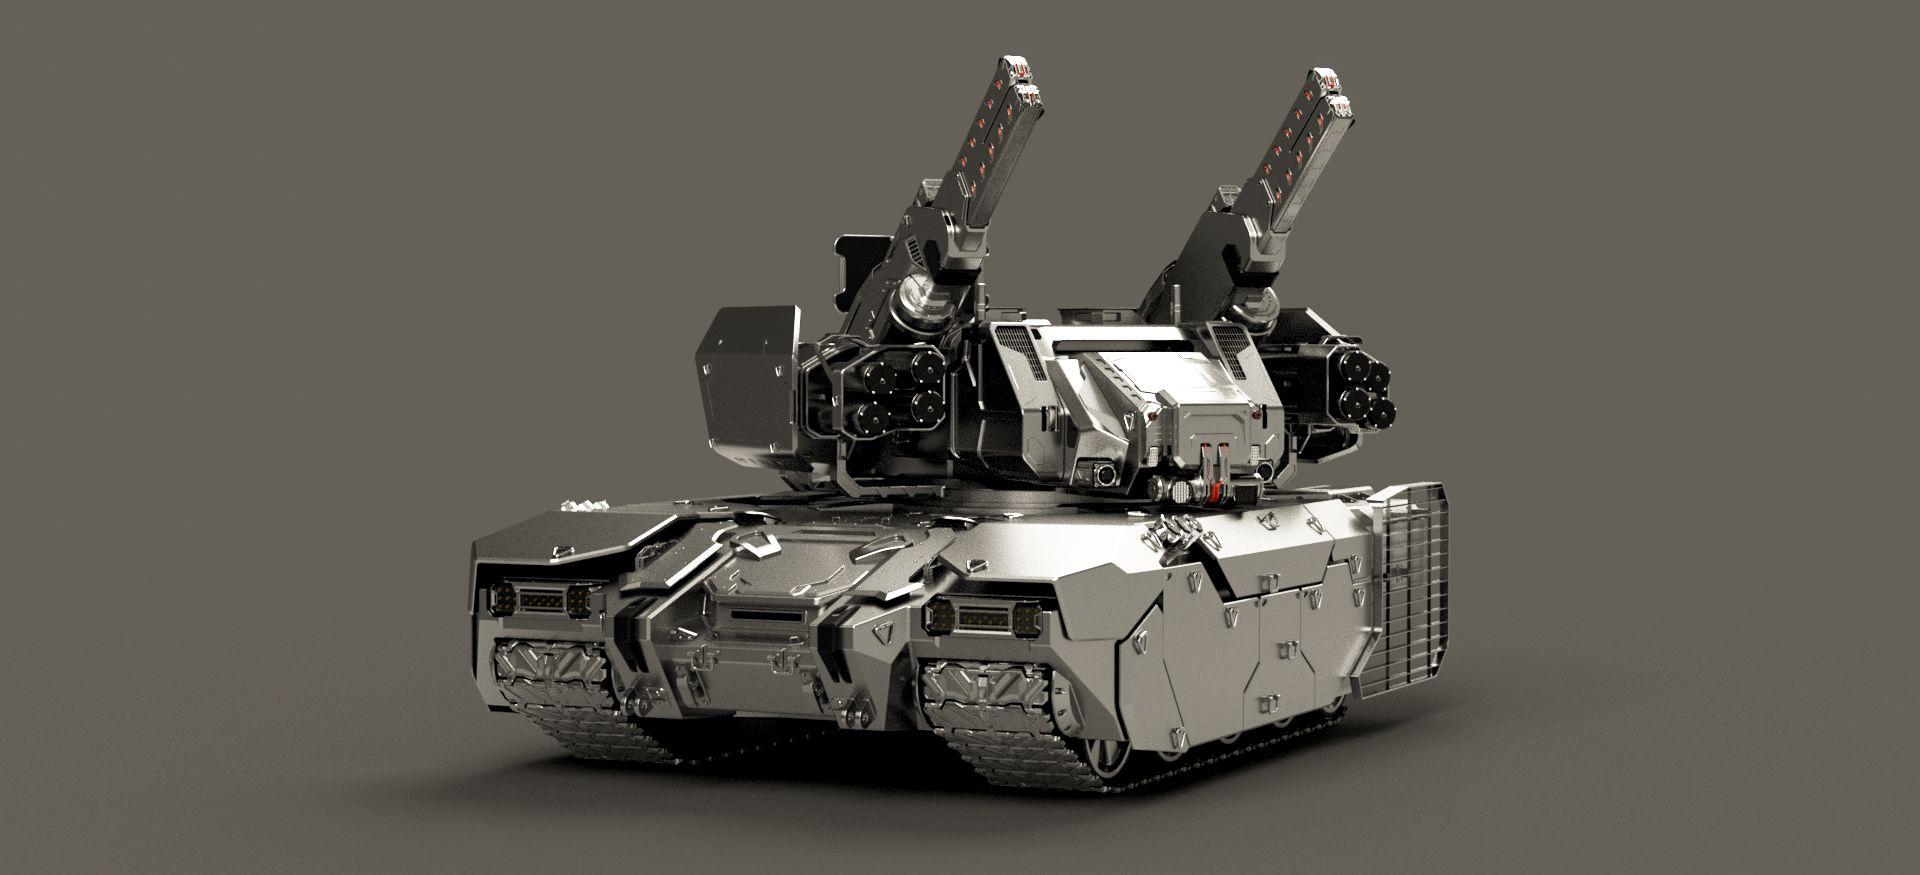 Zprk-tron-v100-v58-v38-3500-3500